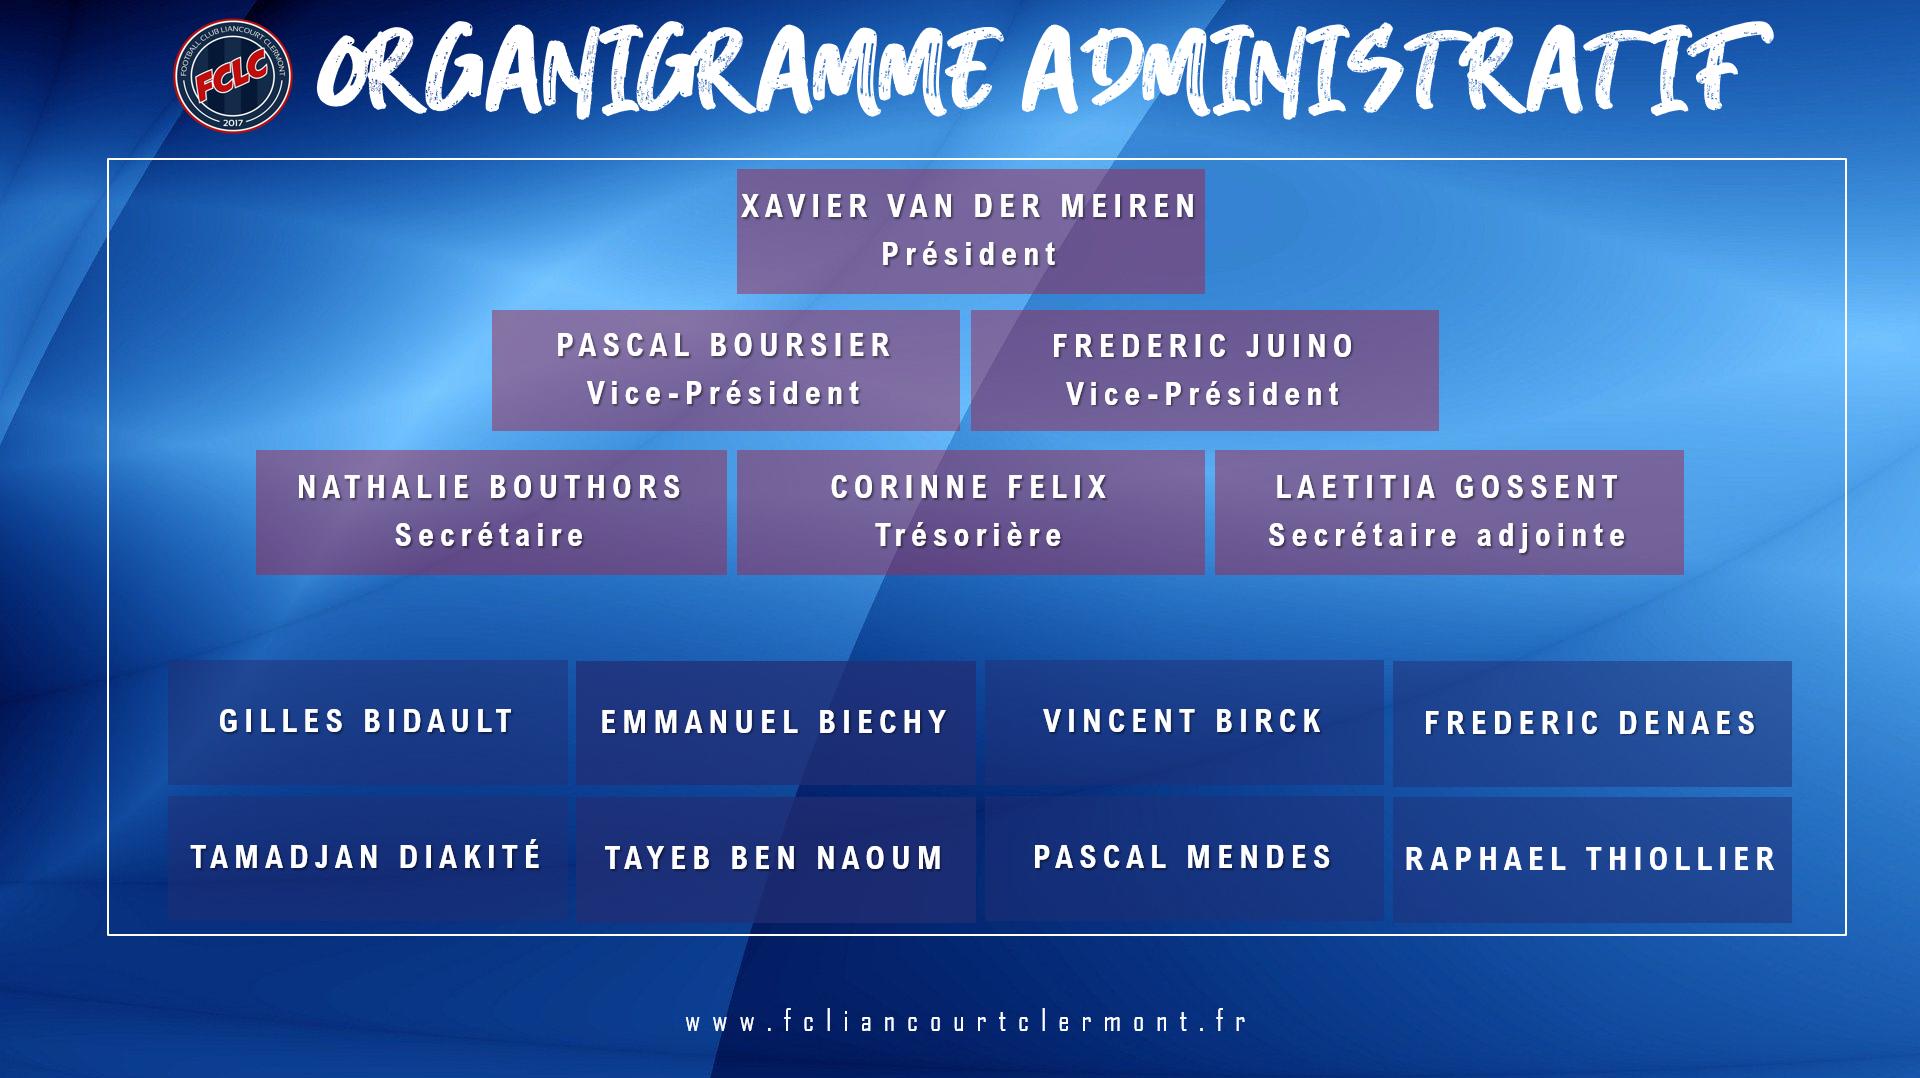 Organigramme administratif 1